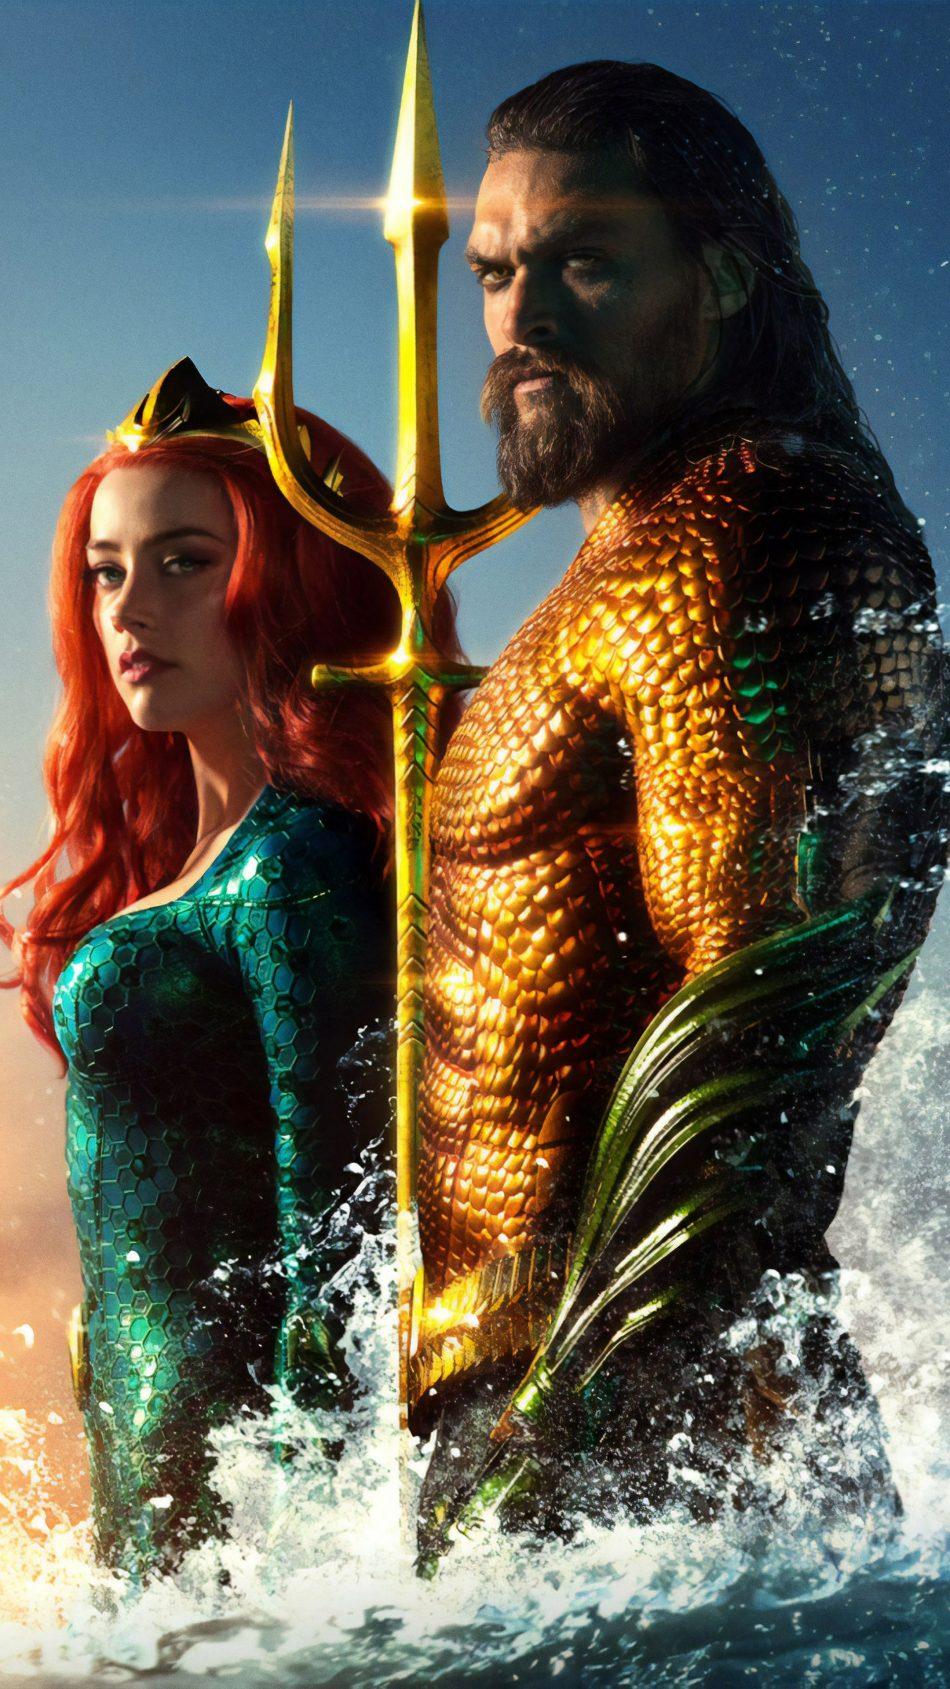 Download Jason Momoa Amber Heard In Aquaman Free Pure 4k Ultra Hd